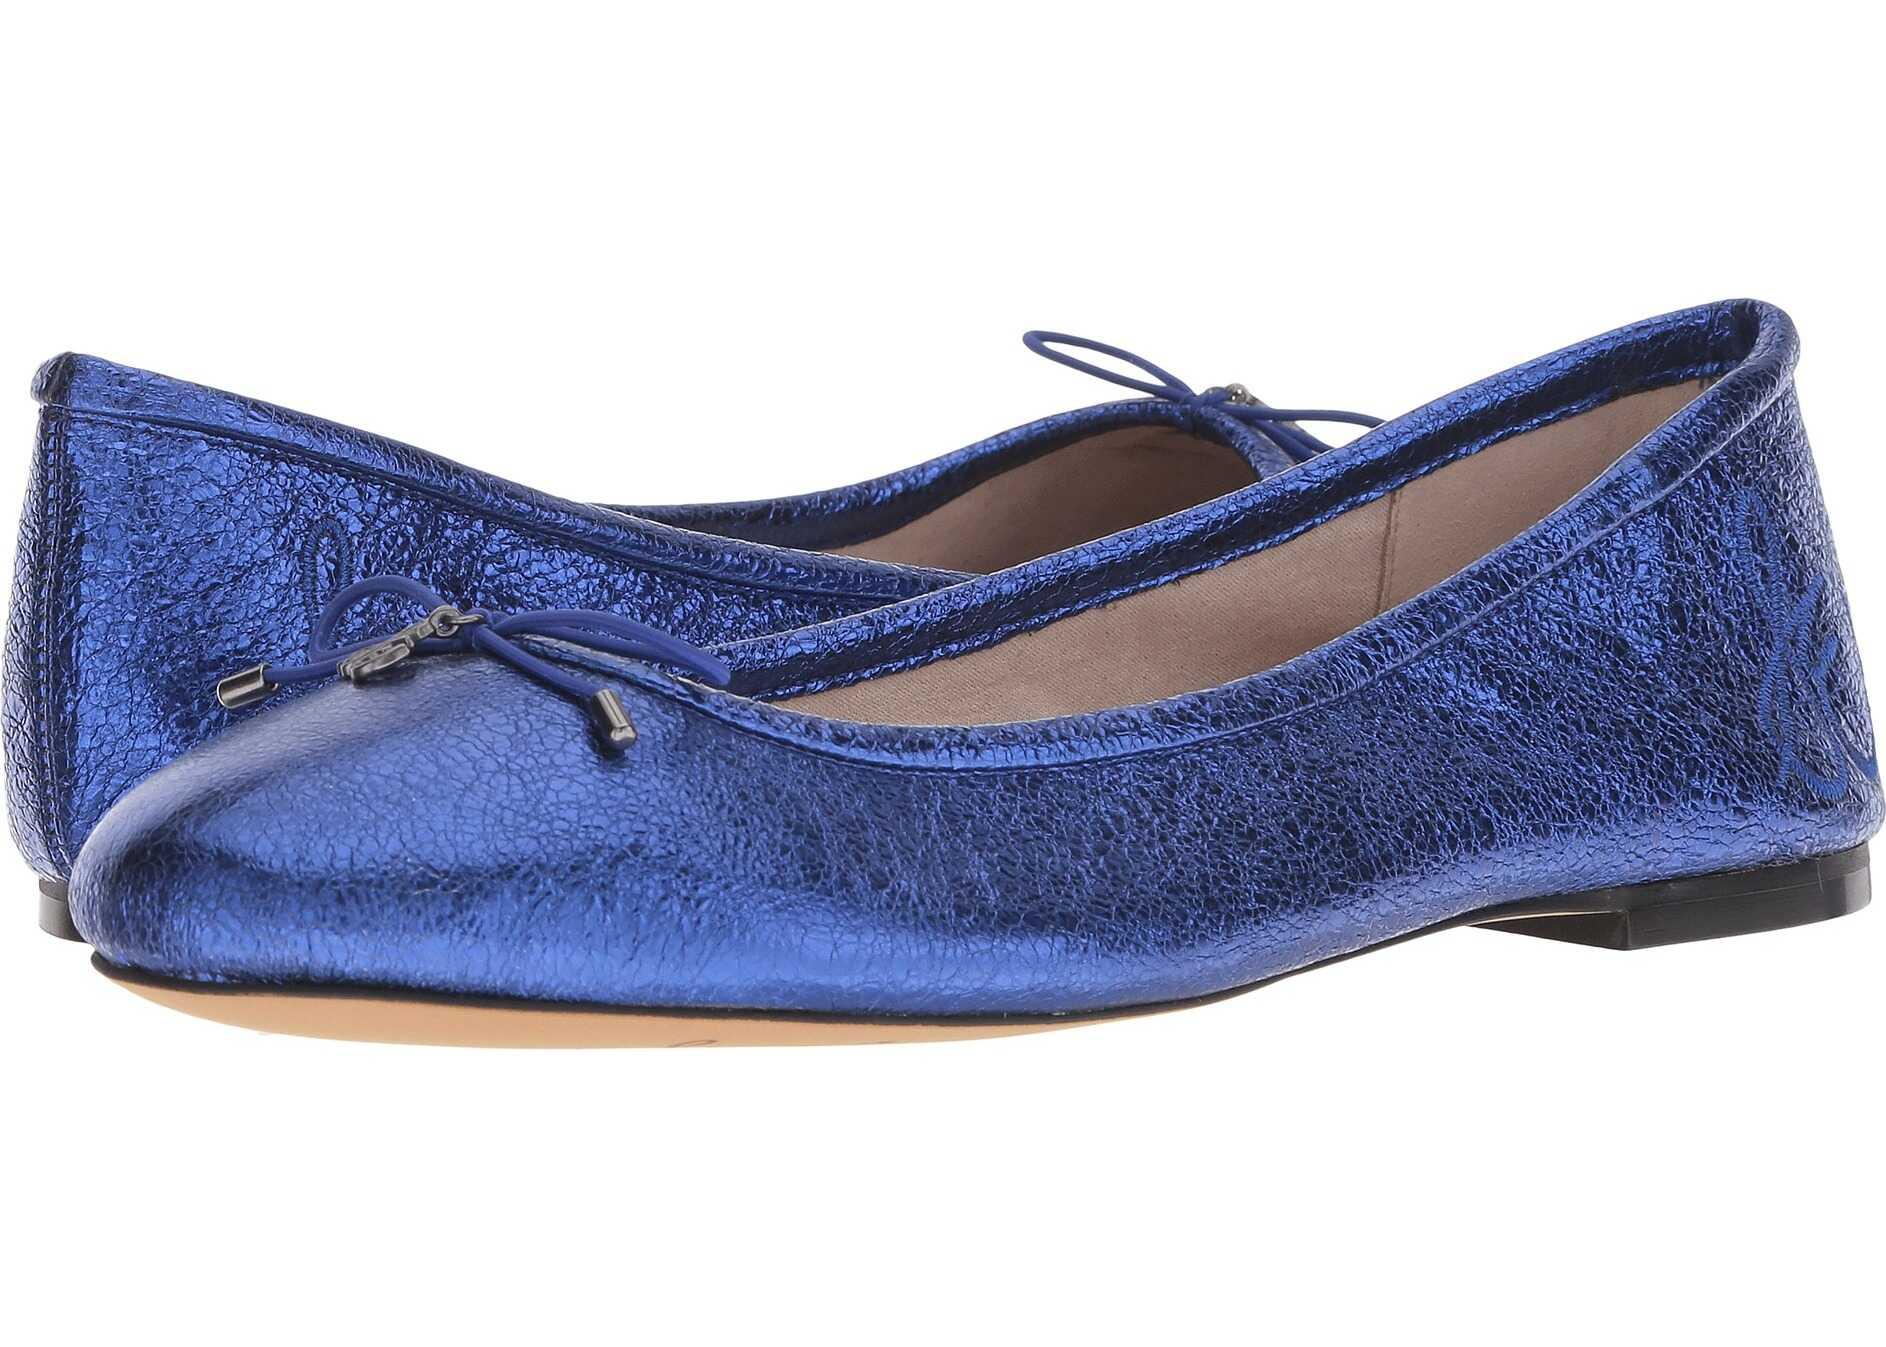 Sam Edelman Felicia Royal Blue Soft Crinkle Metallic Leather